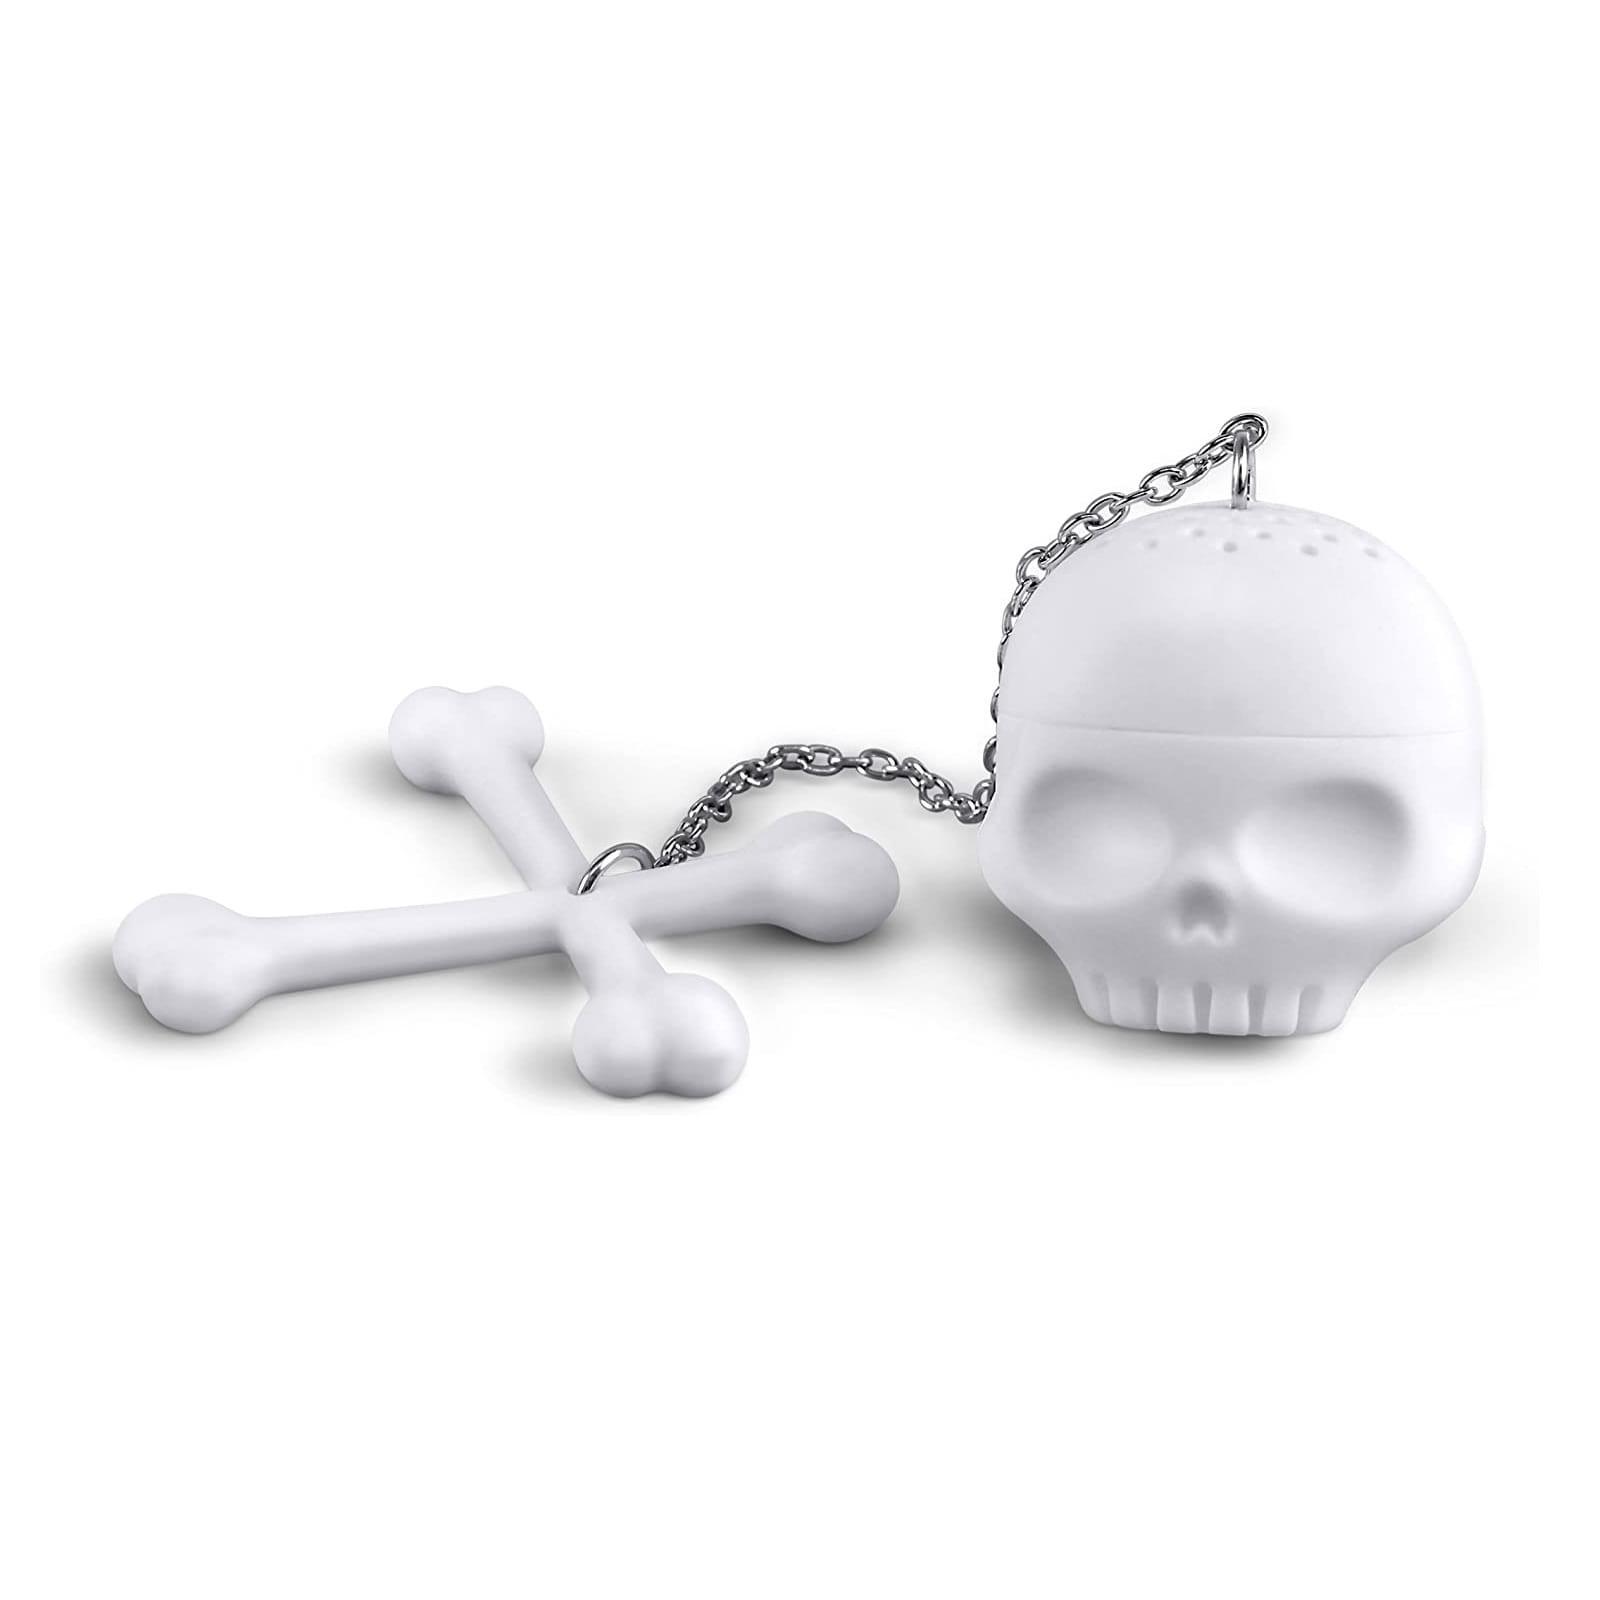 T-Bone Skull Tea Infuser (Silicone)